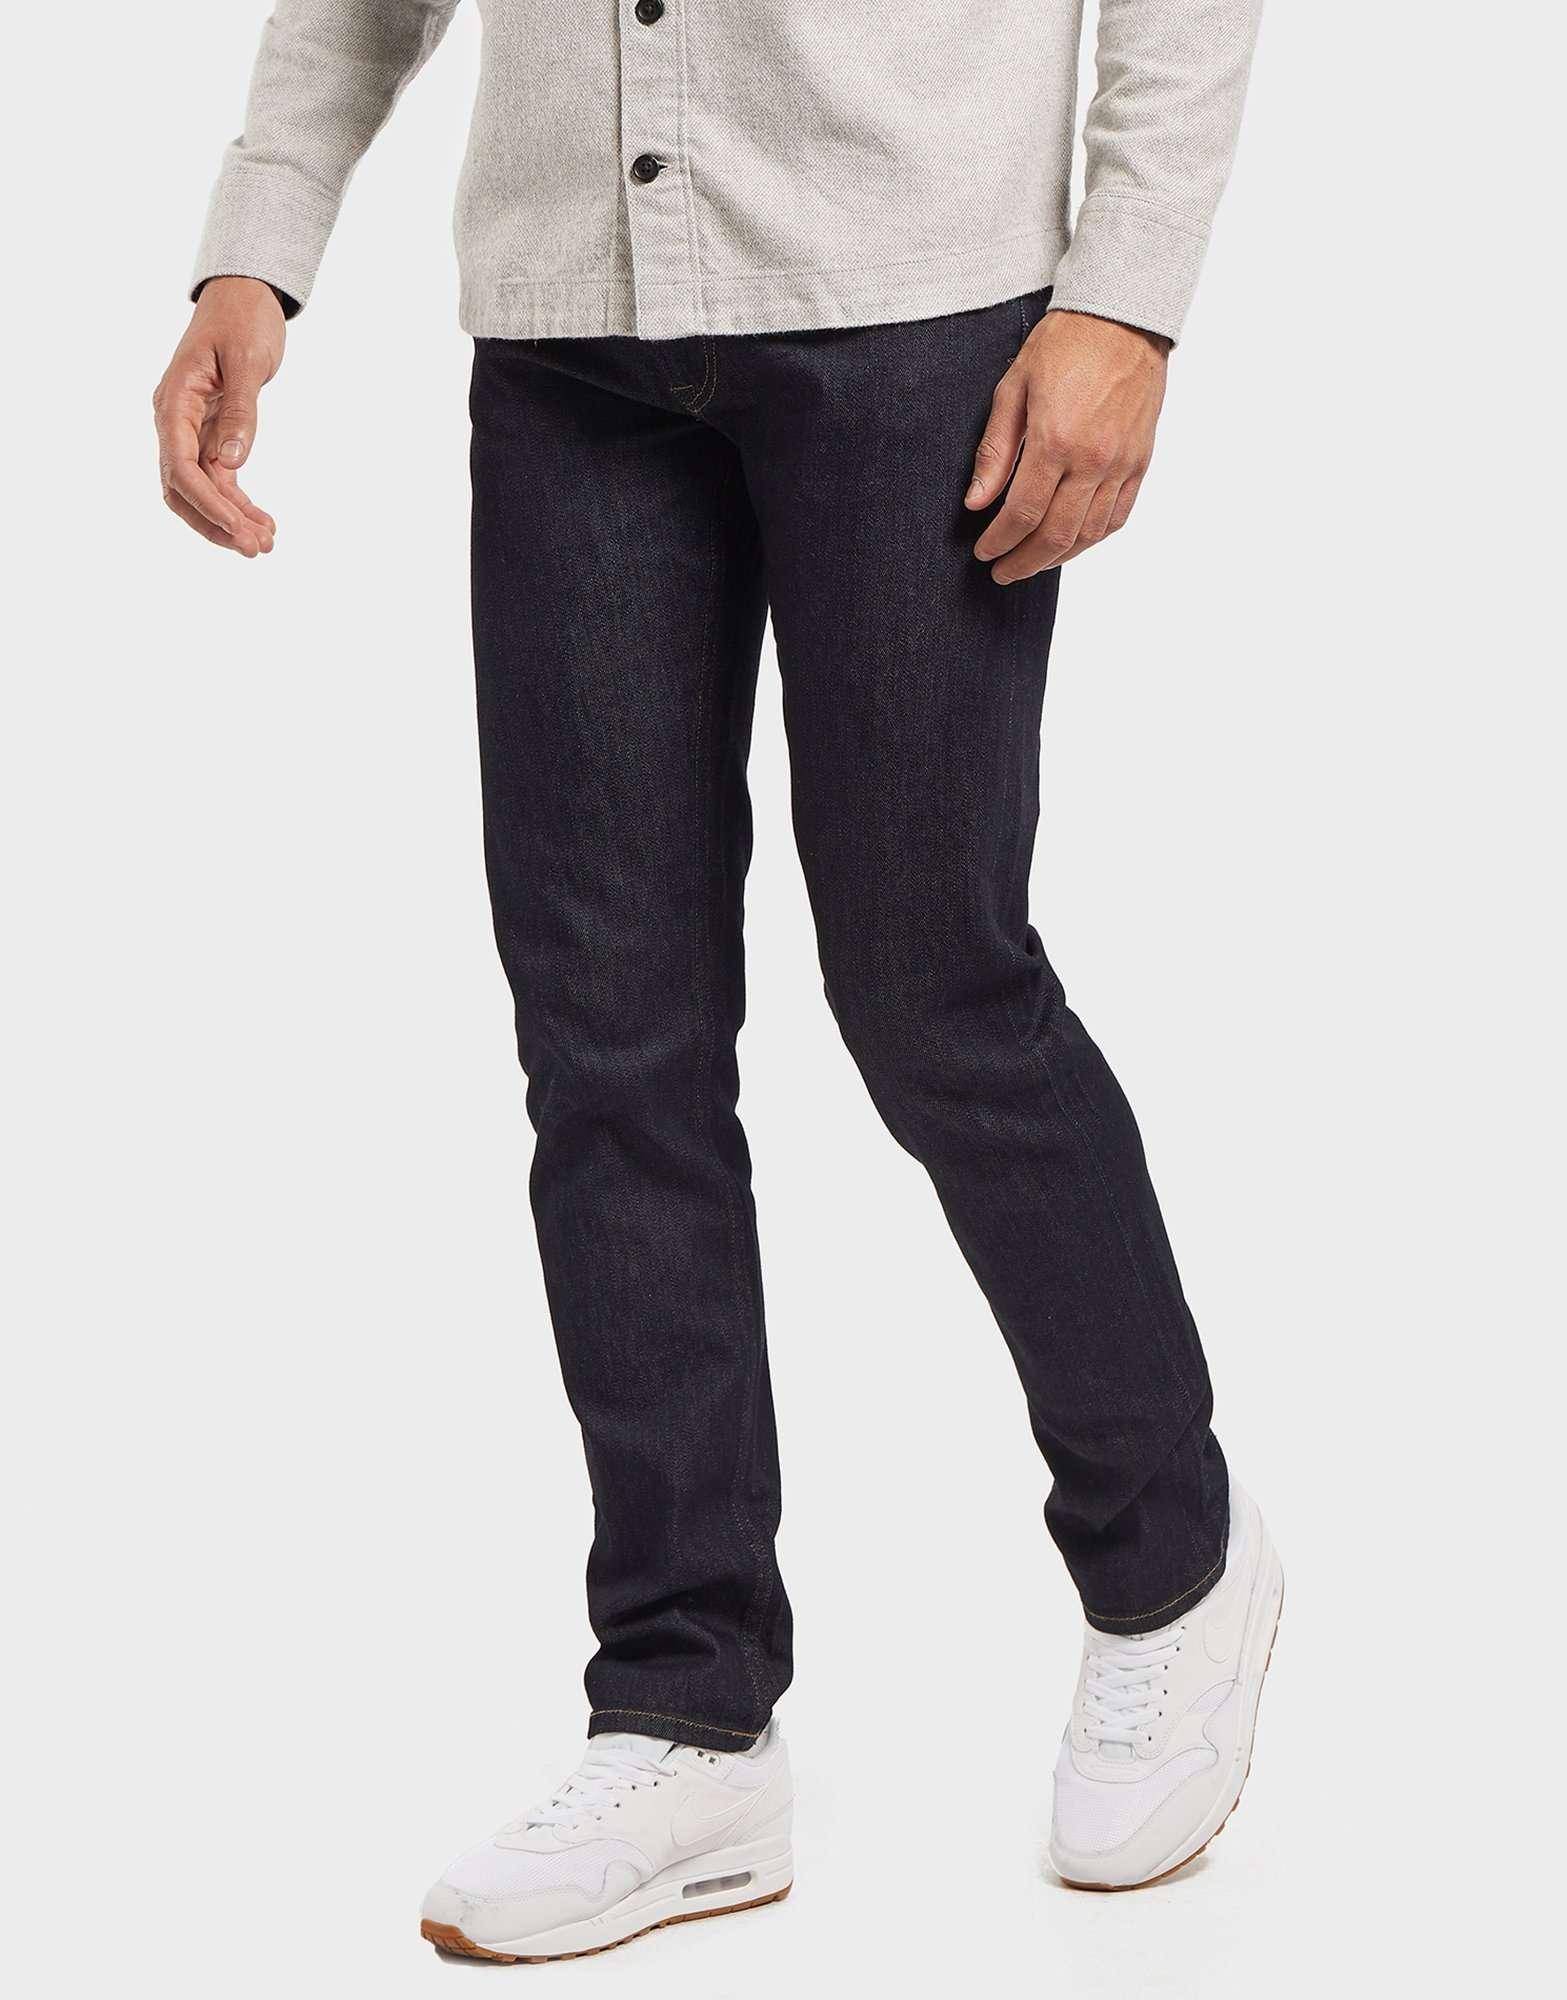 Lacoste Slim Stretch Denim Tapered Jeans